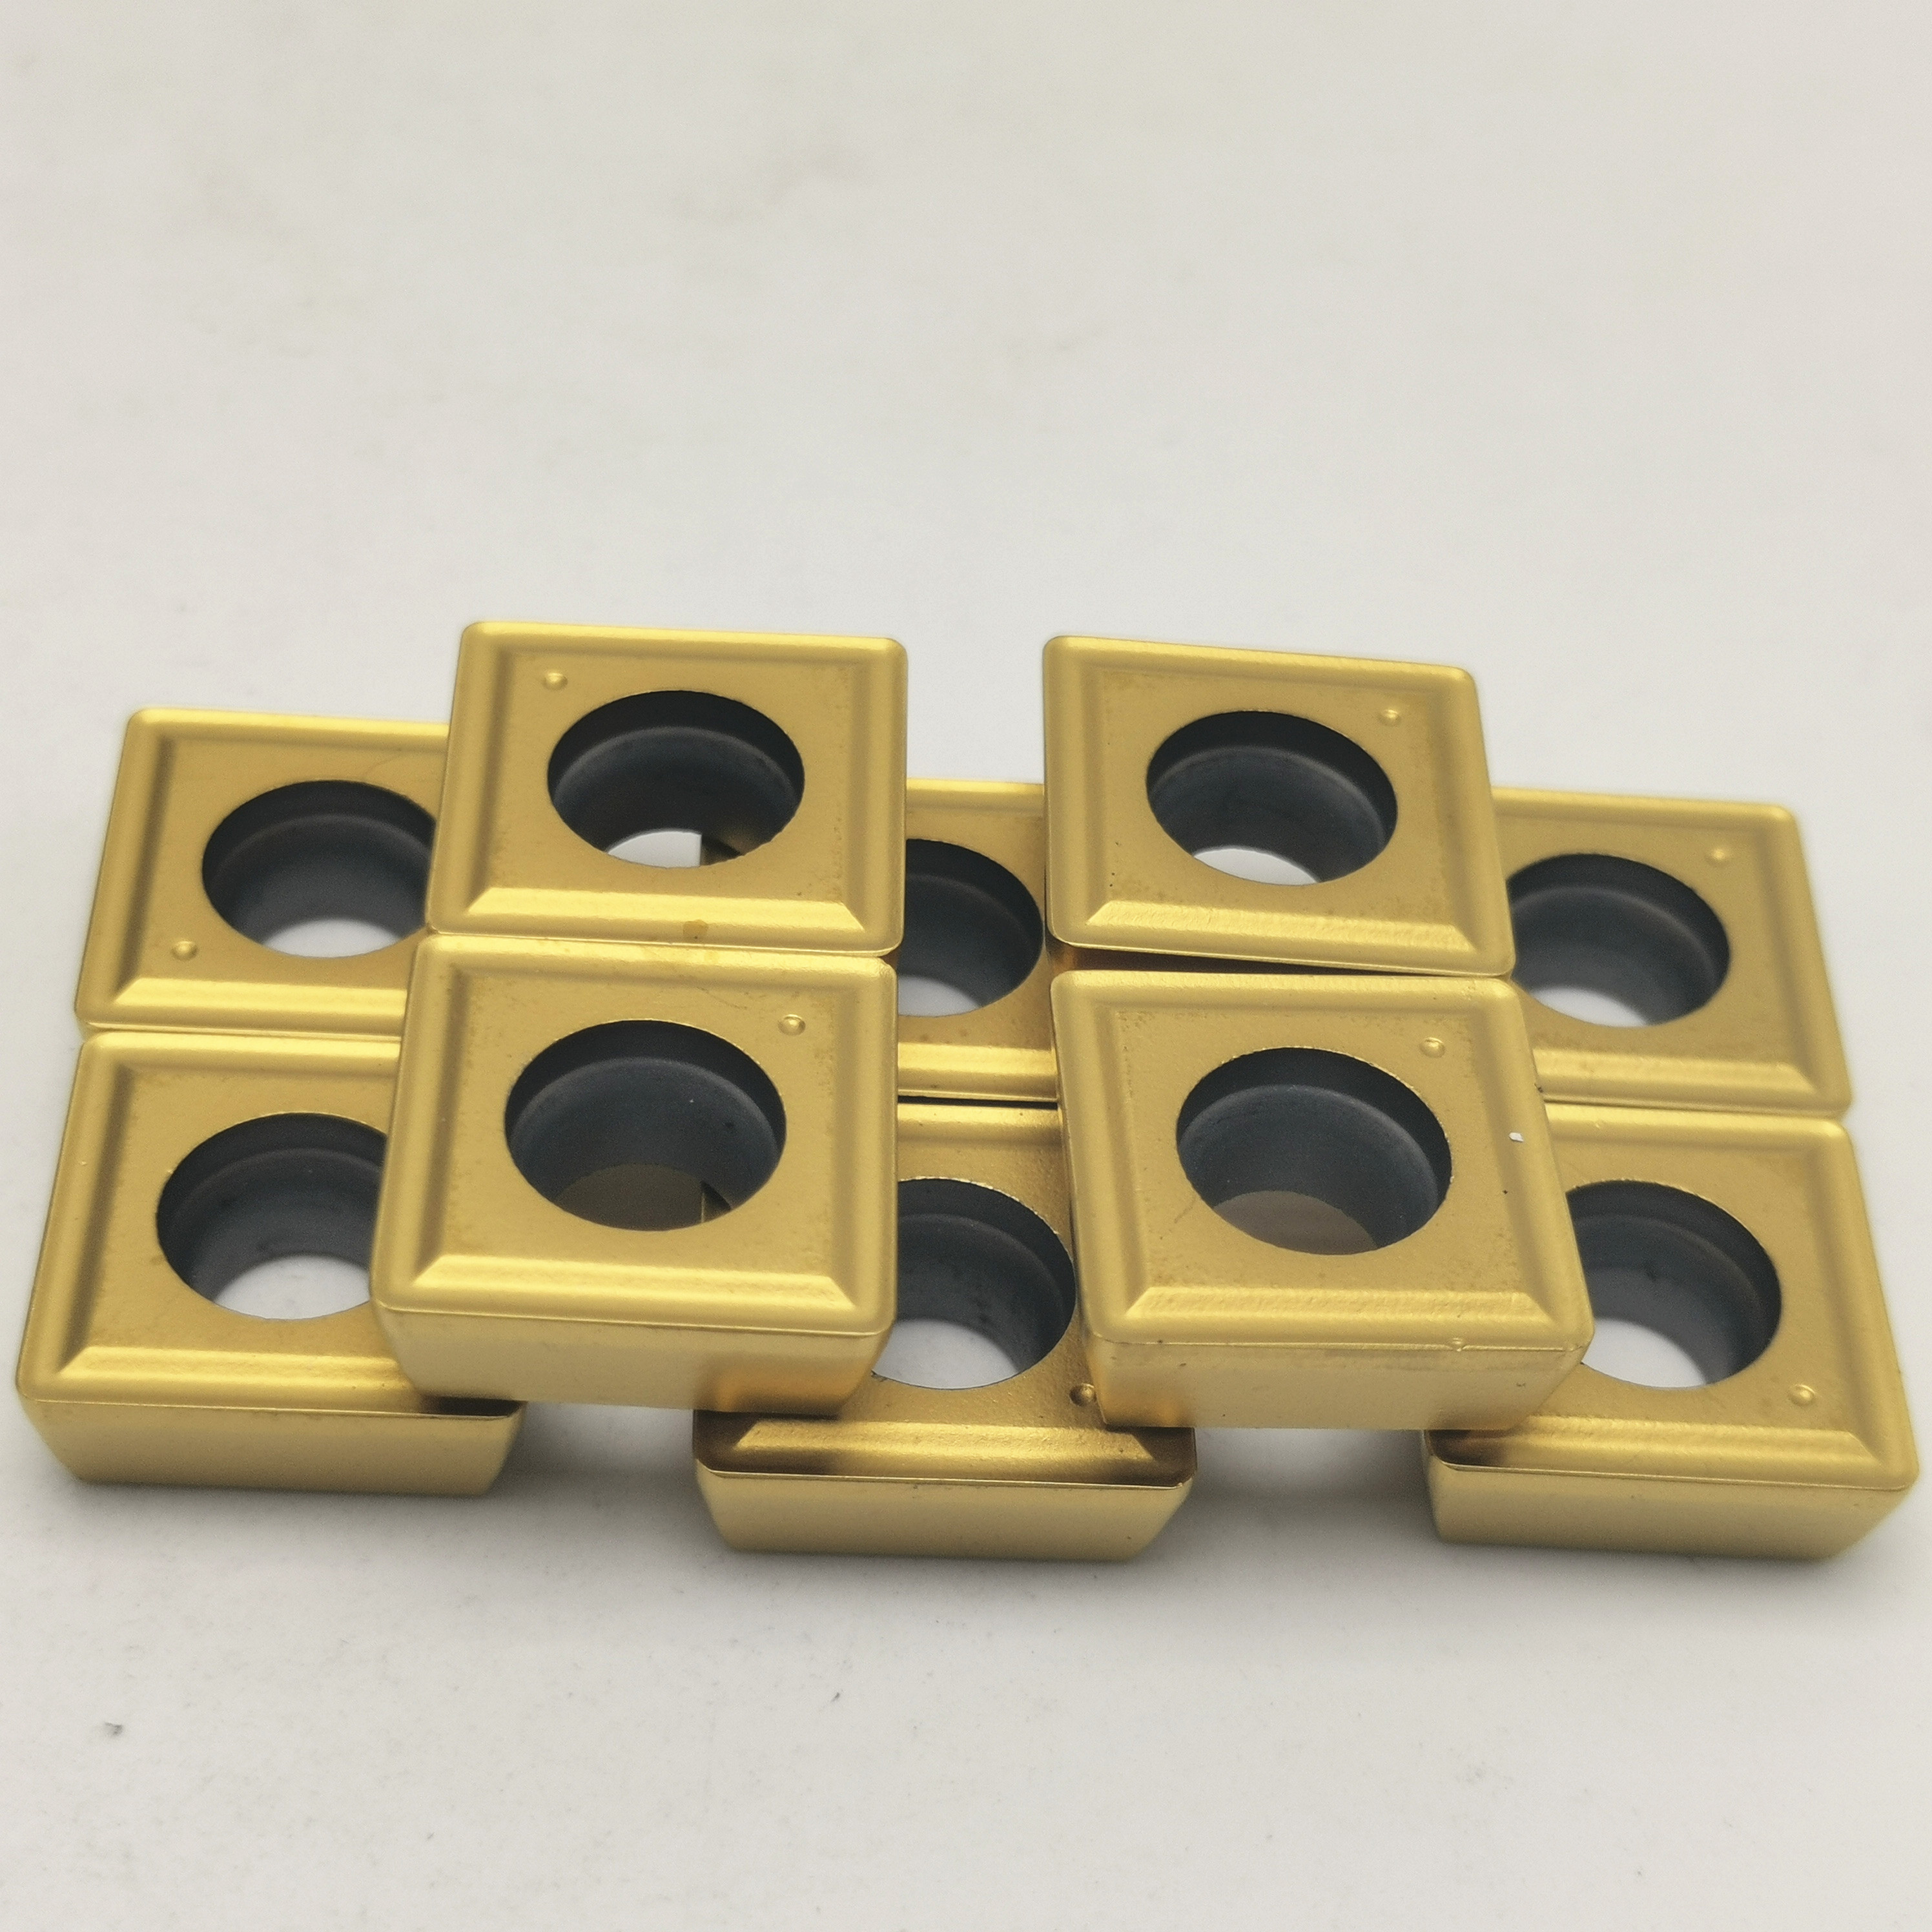 U drills SPMG07T308 DG TT8020 carbide inserts turning tool SPMG07T308 DG TT9030 metal Milling cutter turning insert in Turning Tool from Tools